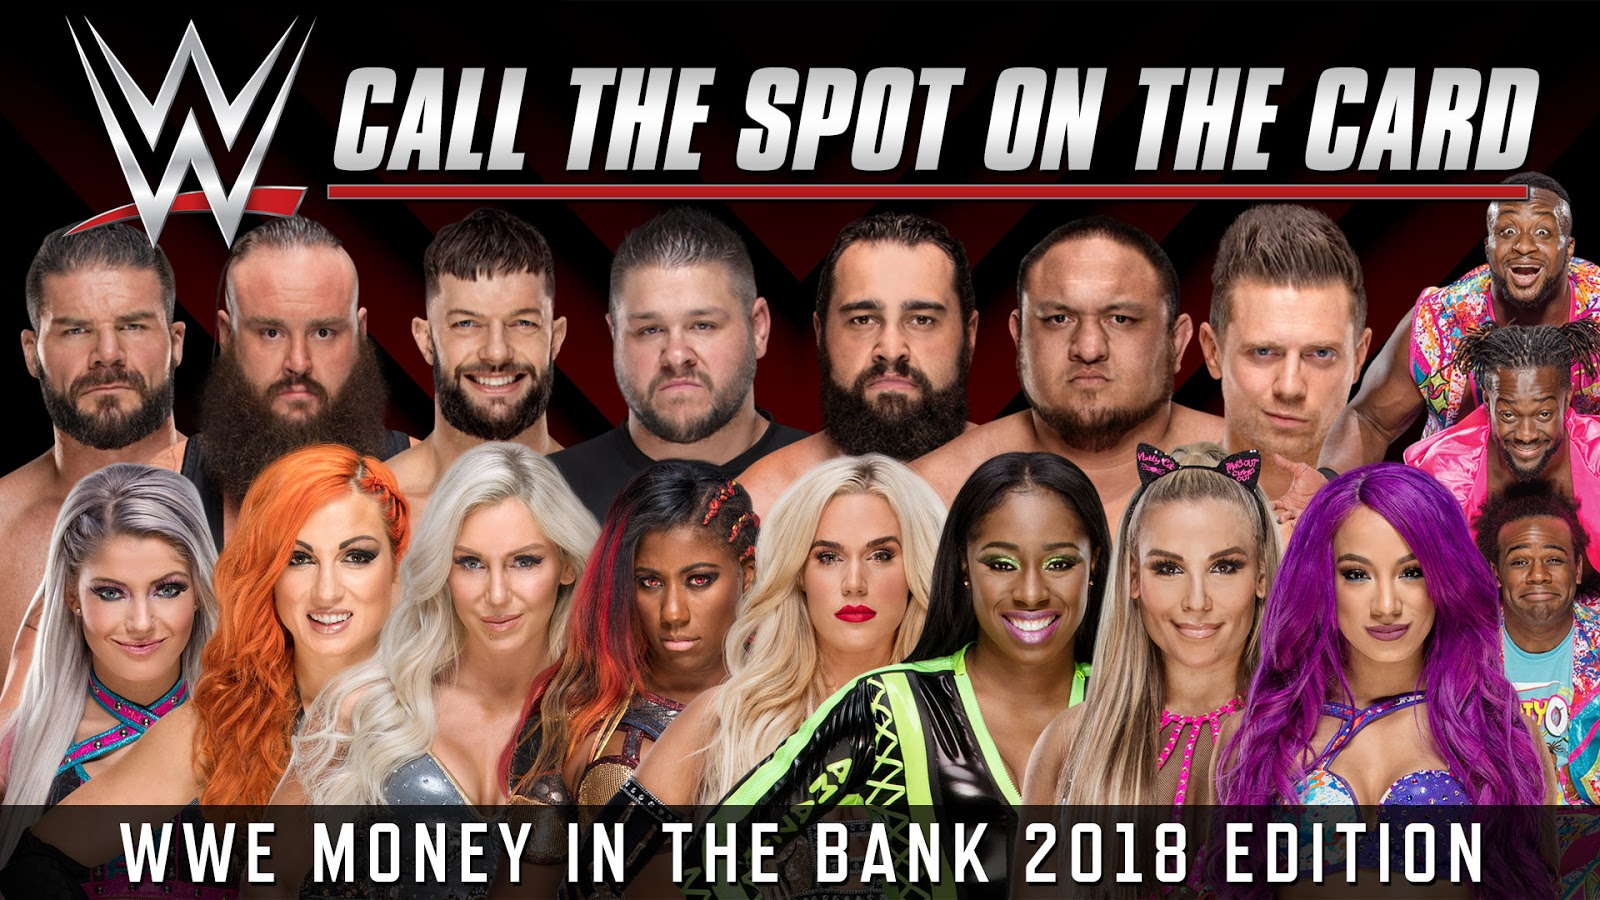 pick the wrestling ranking WWE segment